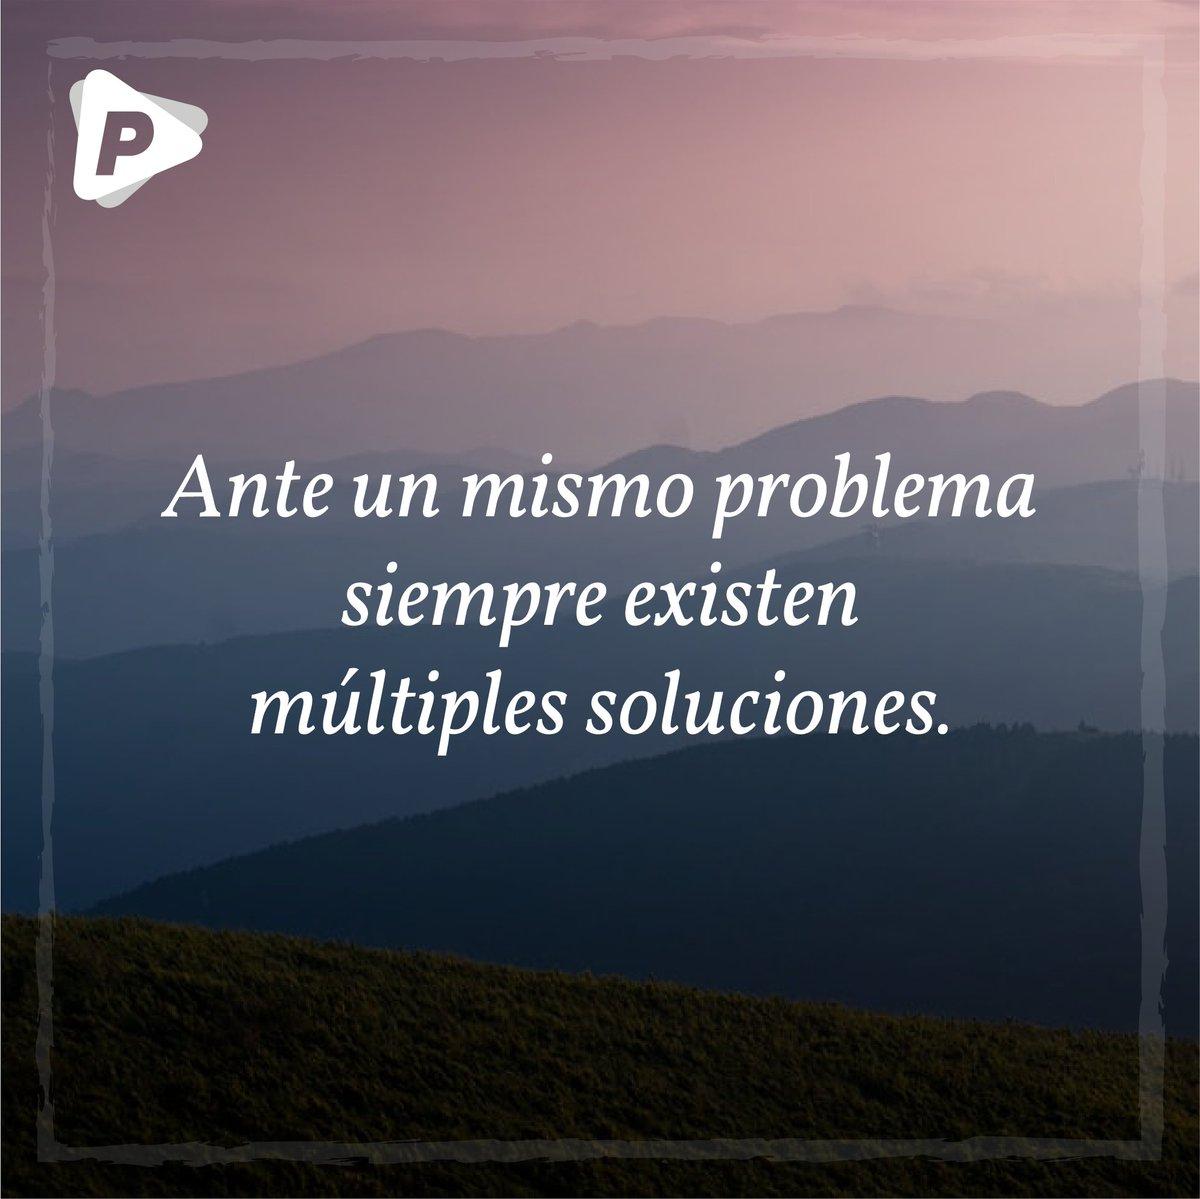 ✅ Mas información https://t.co/9M00RHrXlJ  #Honduras #SanPedroSula #Tegucigalpa #Diseño #Design #Creatividad #Publicidad #Soporte #SocialMedia #Windows #Support https://t.co/Urxk6GZPkt